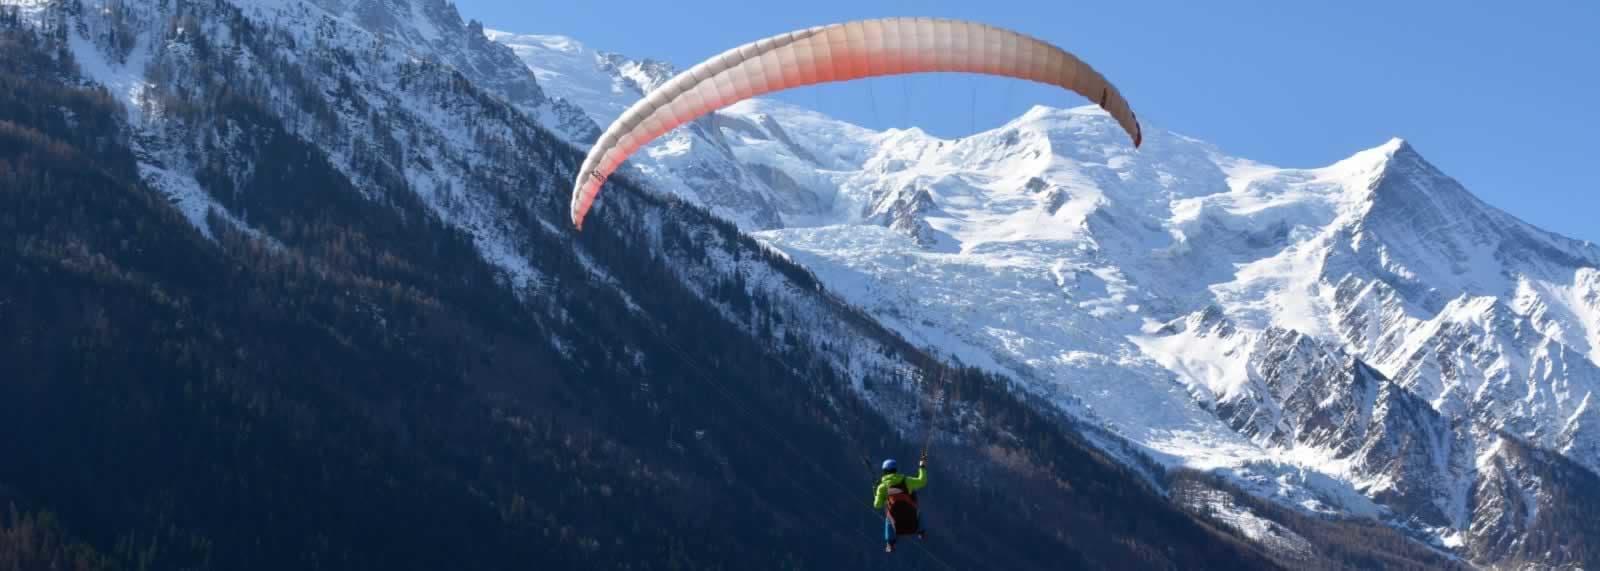 Paragliding in Chamonix - SkySchool